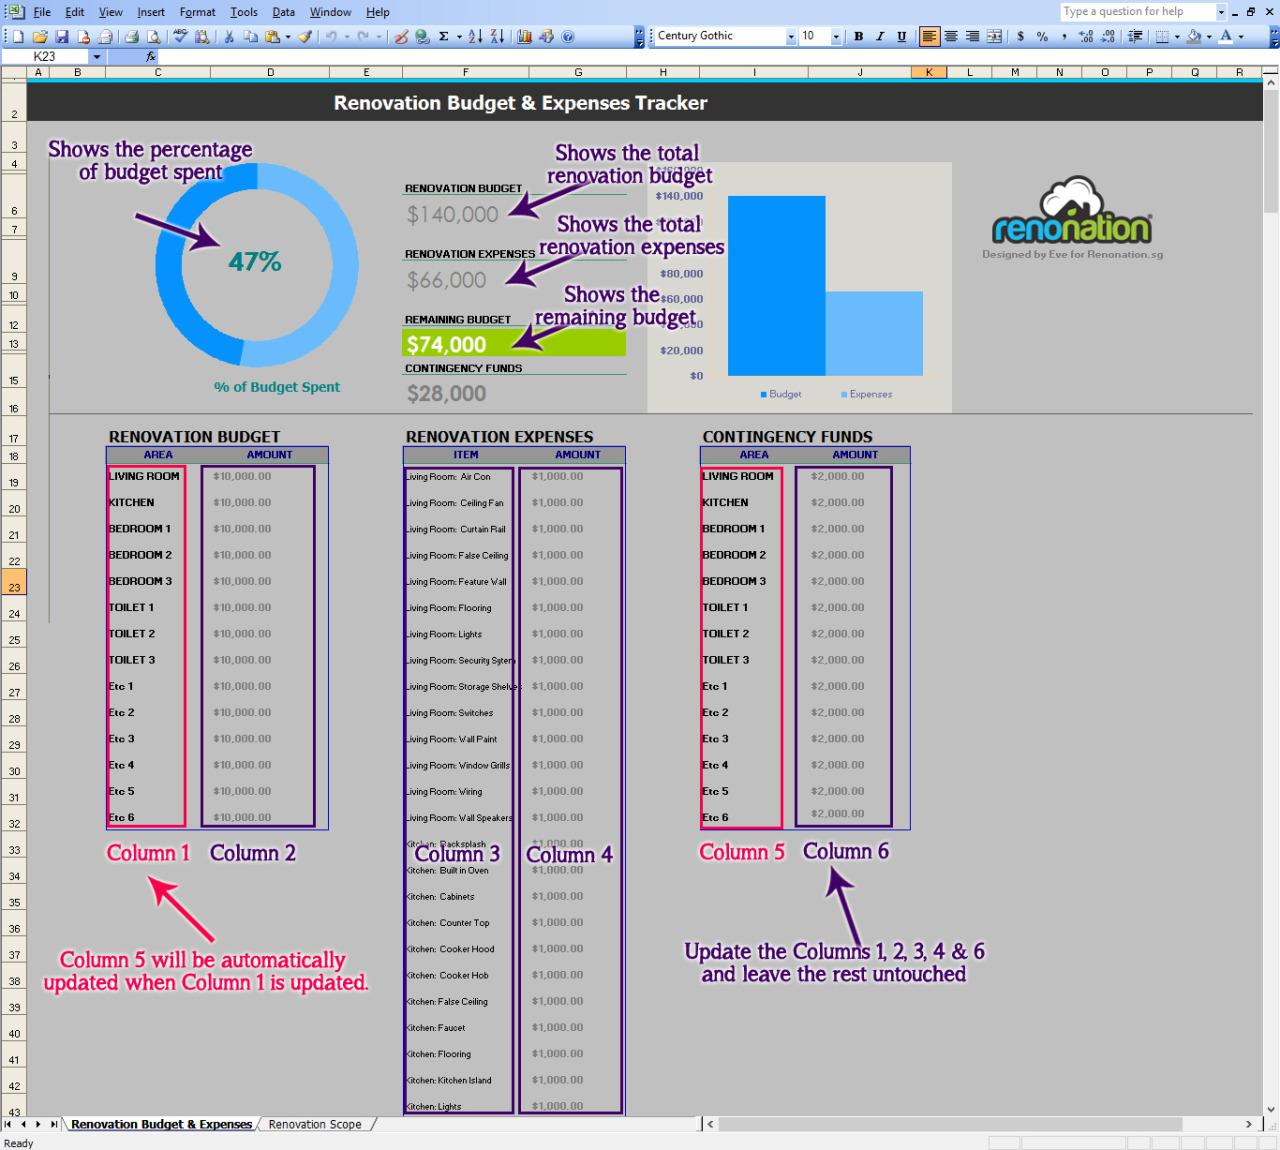 House Renovation Budget Spreadsheet Inside Renovation Budget  Expenses Tracker